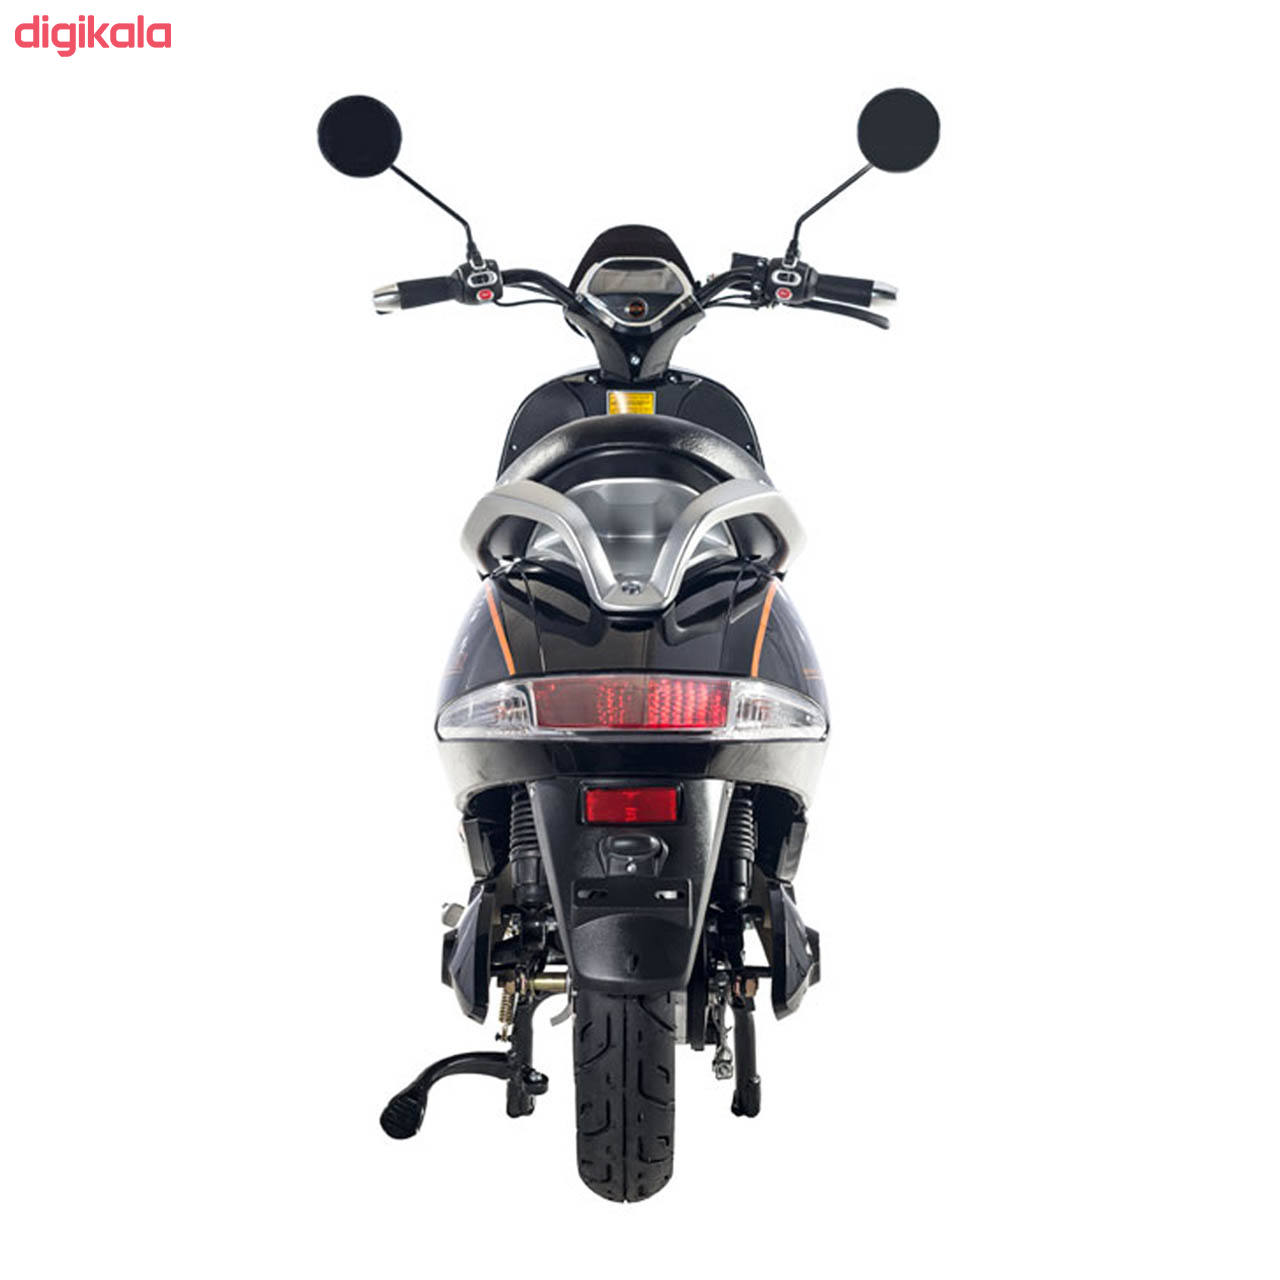 موتورسیکلت سپهر مدل 1600SKZ وات سال 1399 main 1 4